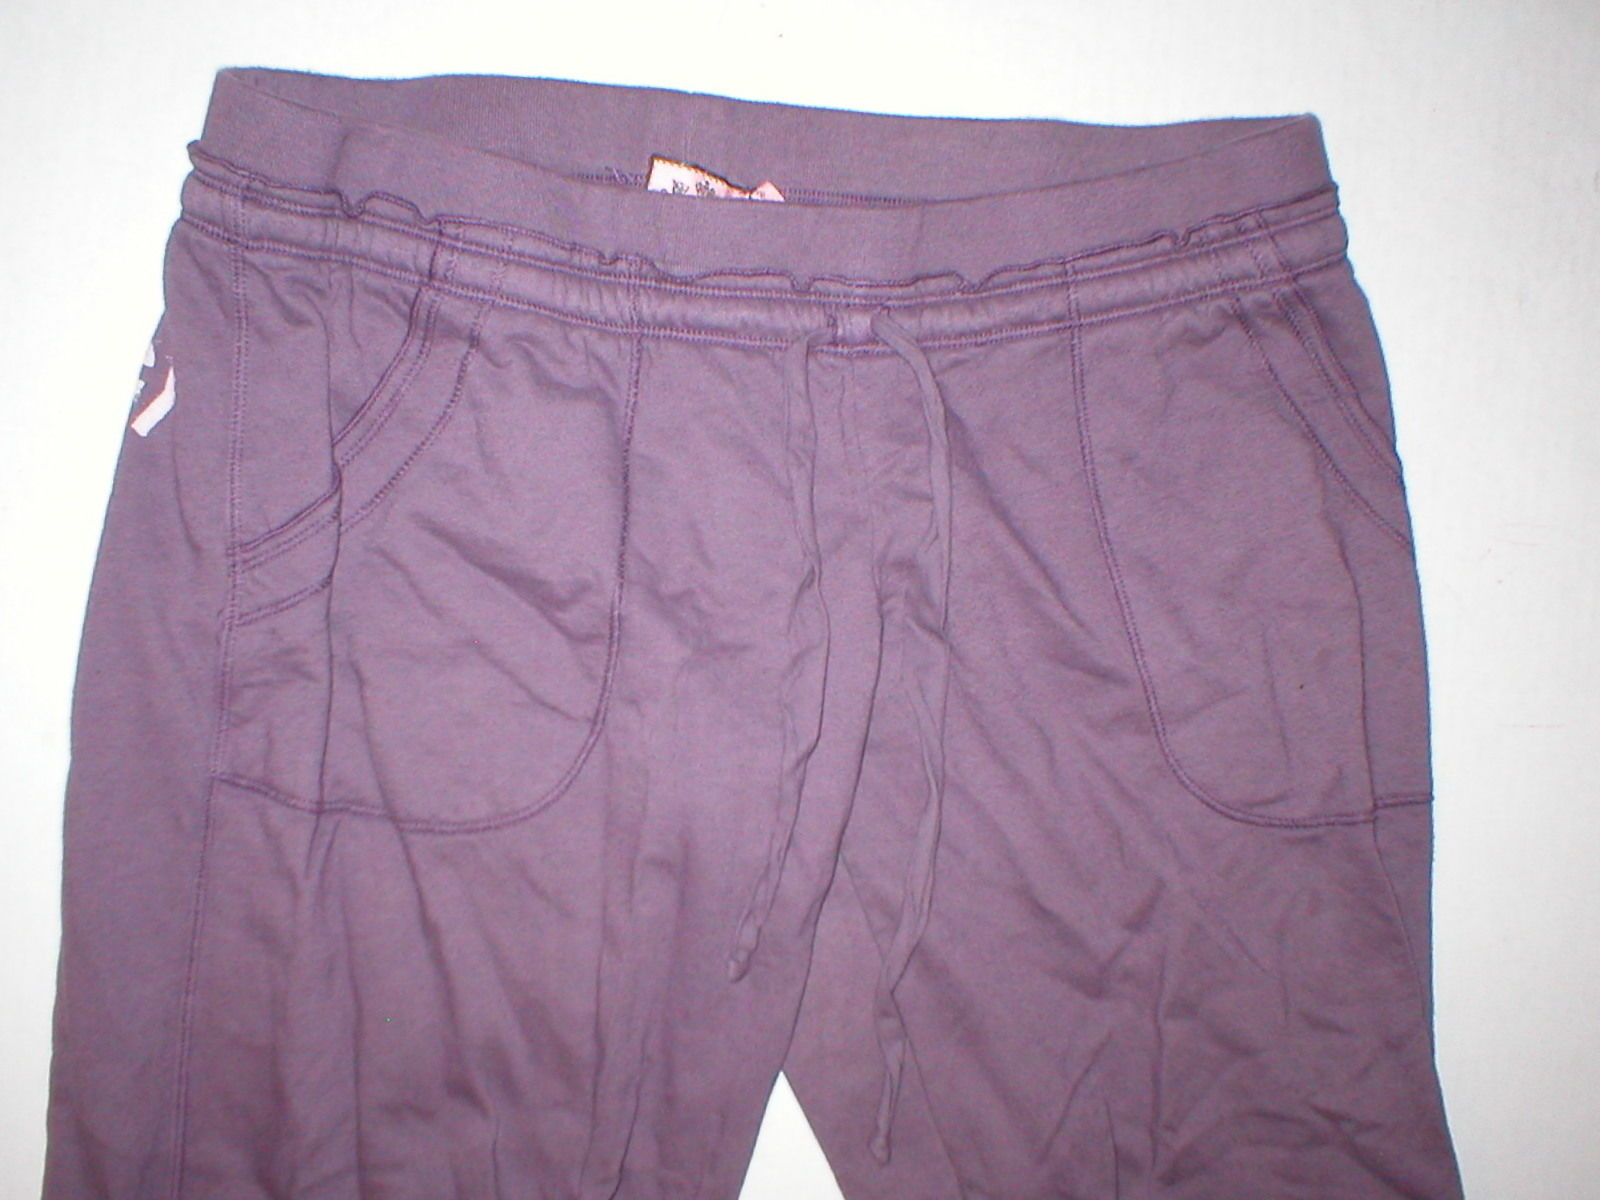 EUC Womens Large Juicy Couture Pants Purple L Pockets Skull Wings Logo 32 inseam image 4